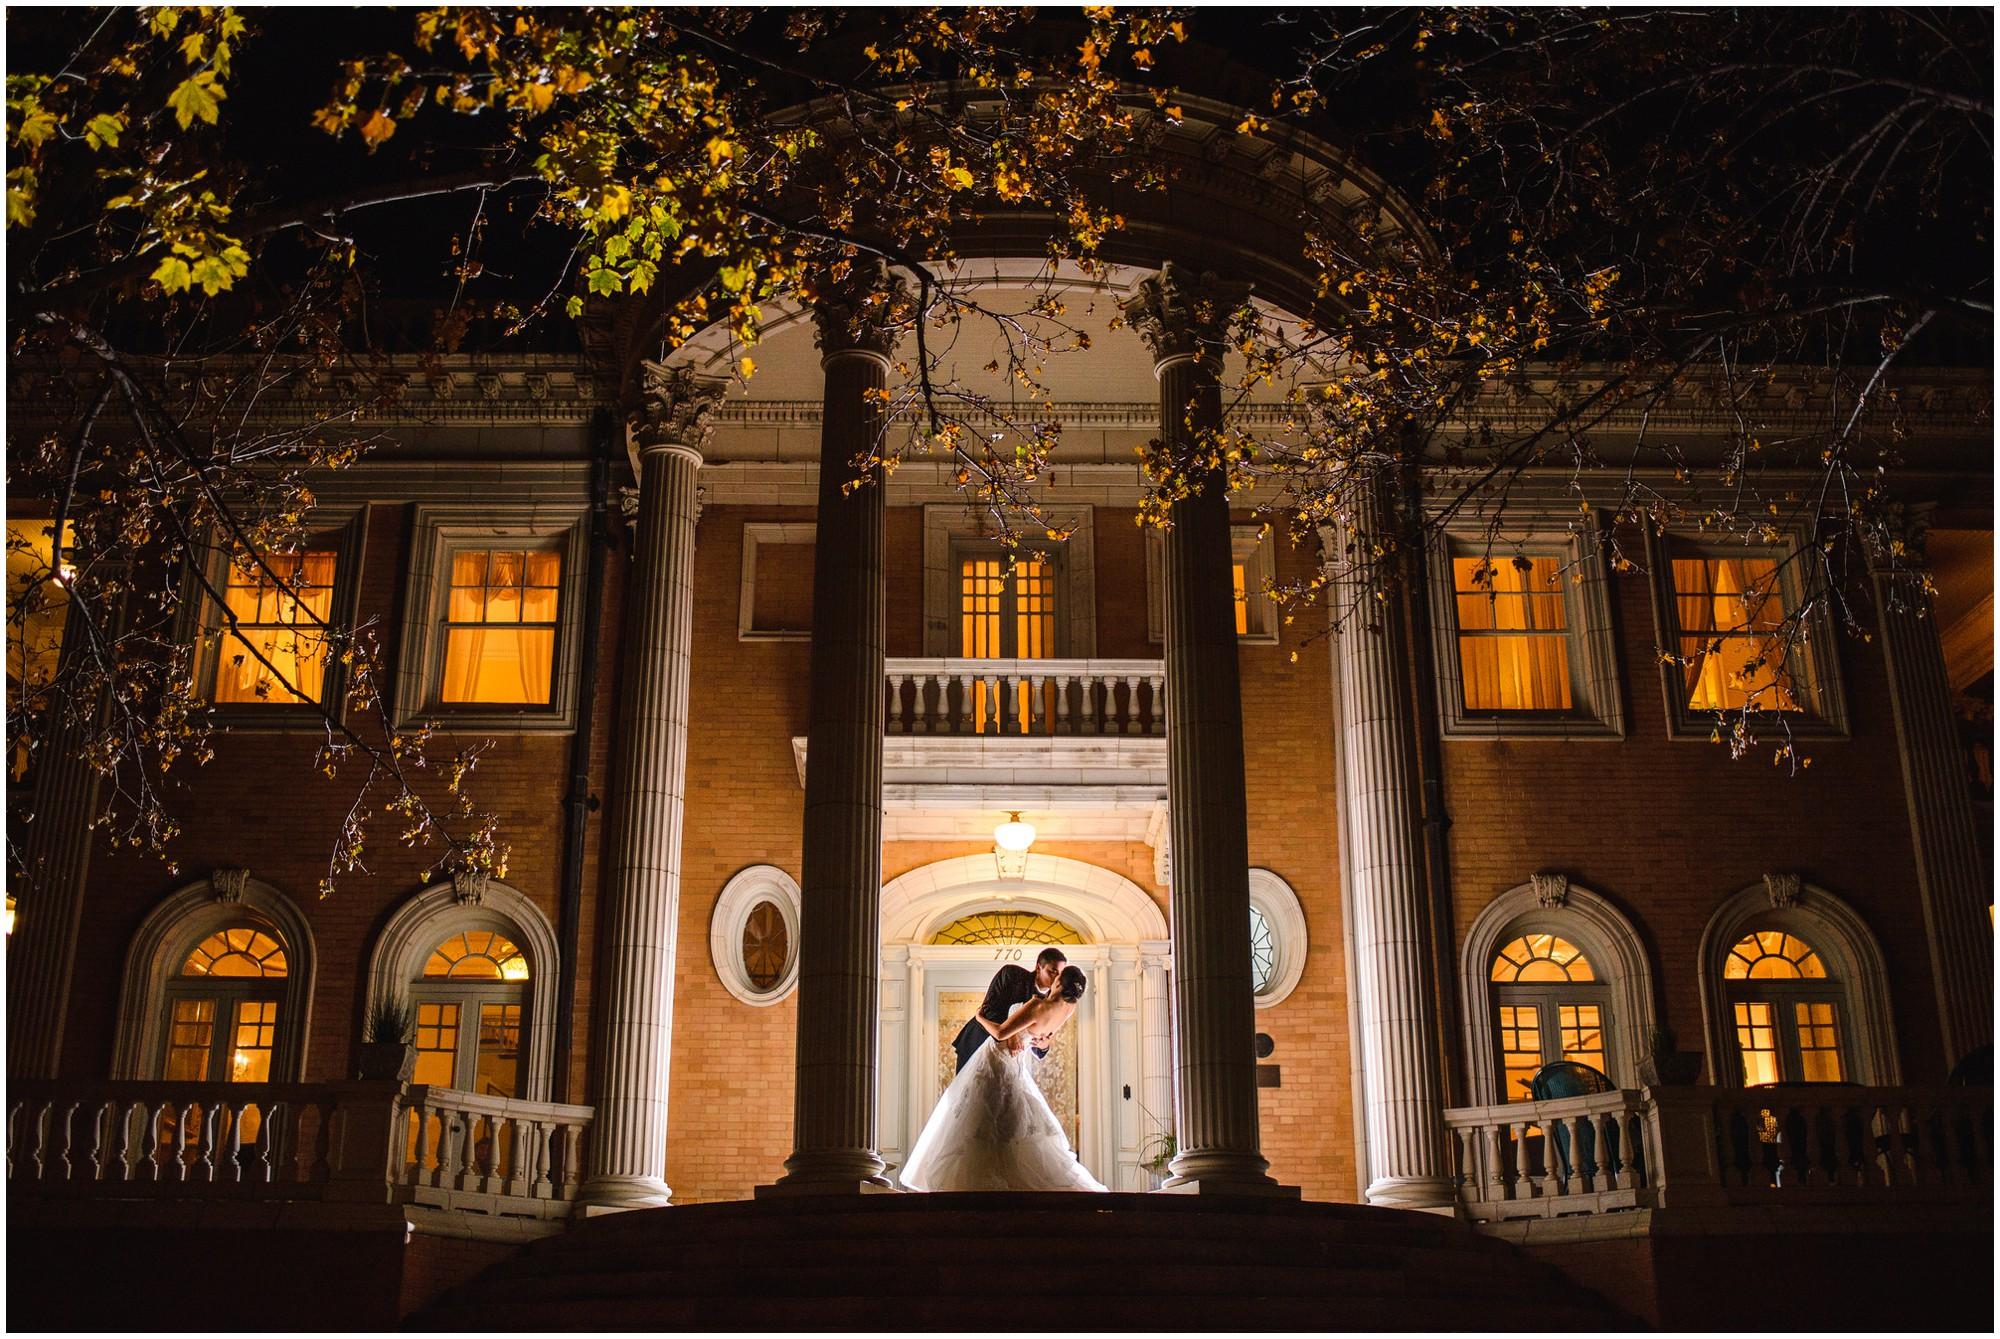 1125-Denver-Grant-Humphreys-Mansion-Wedding.jpg